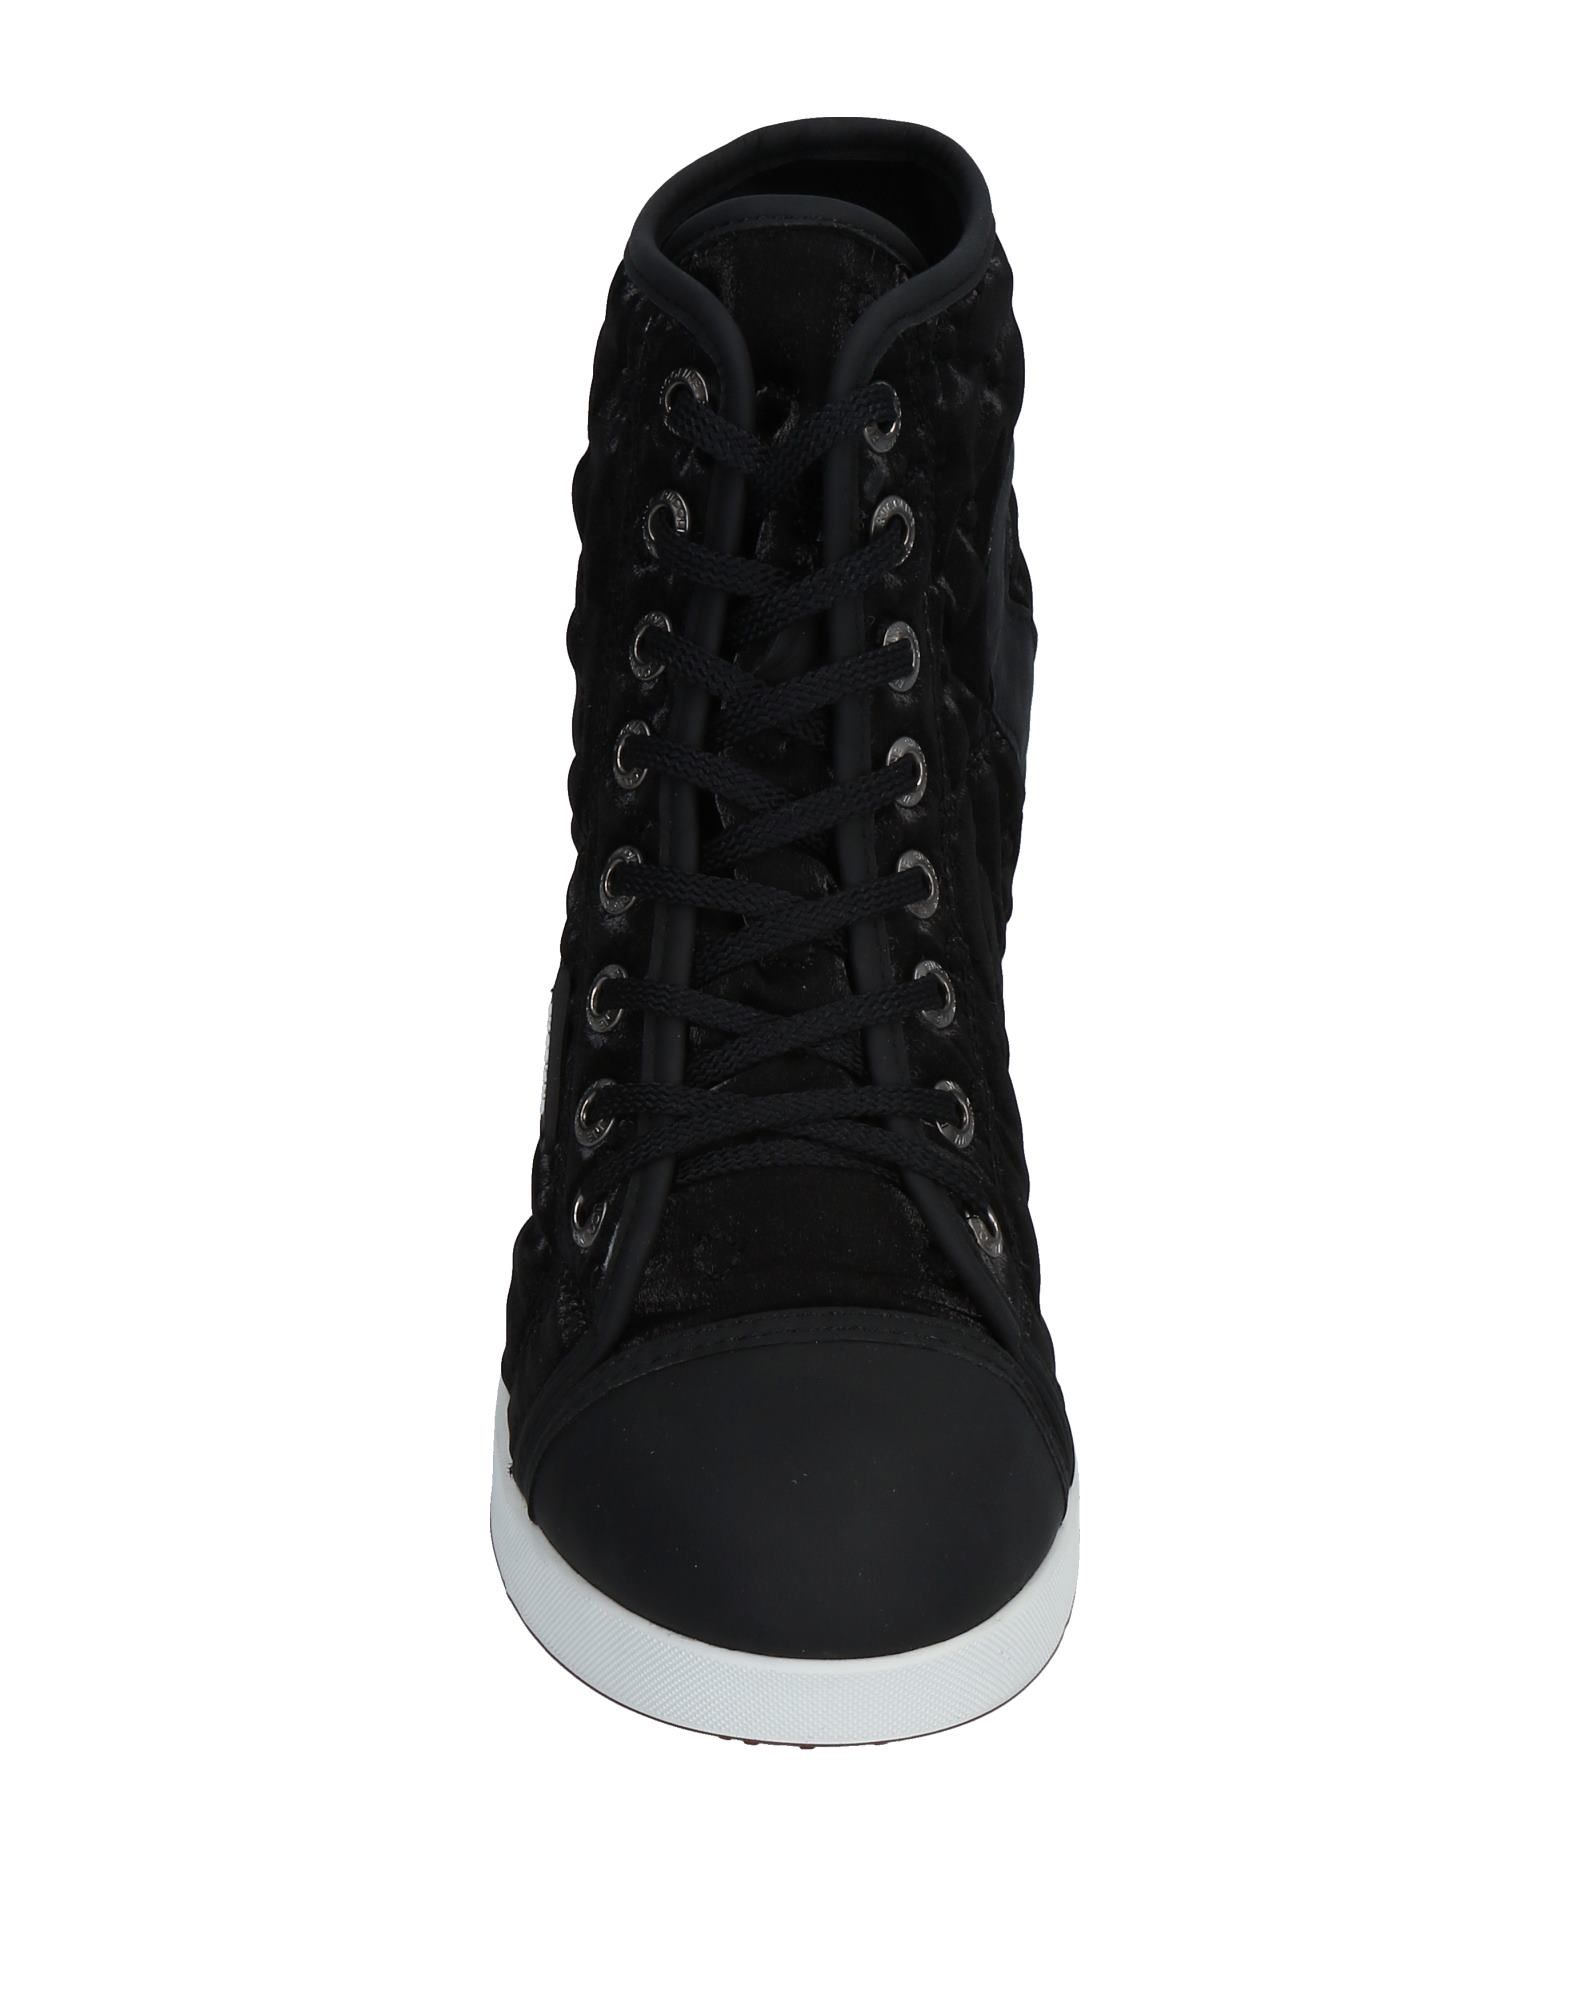 Gut um Sneakers billige Schuhe zu tragenRuco Line Sneakers um Damen  11471406BD 346c75